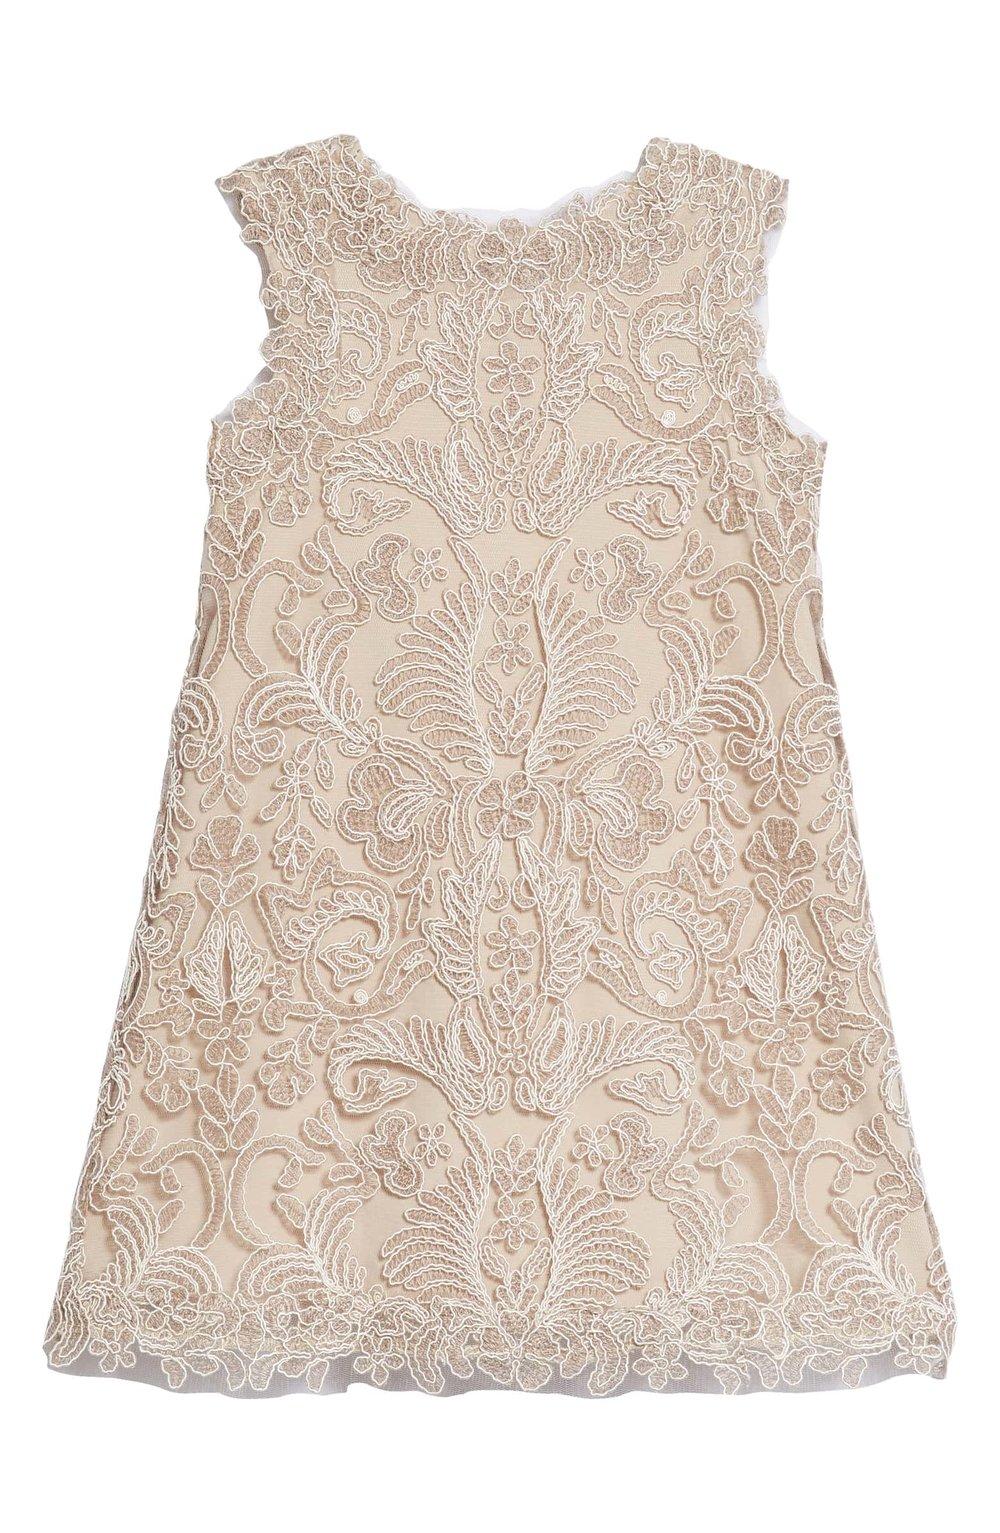 TADASHI SHOJI Embroidered Sheath Dress | Nordstrom